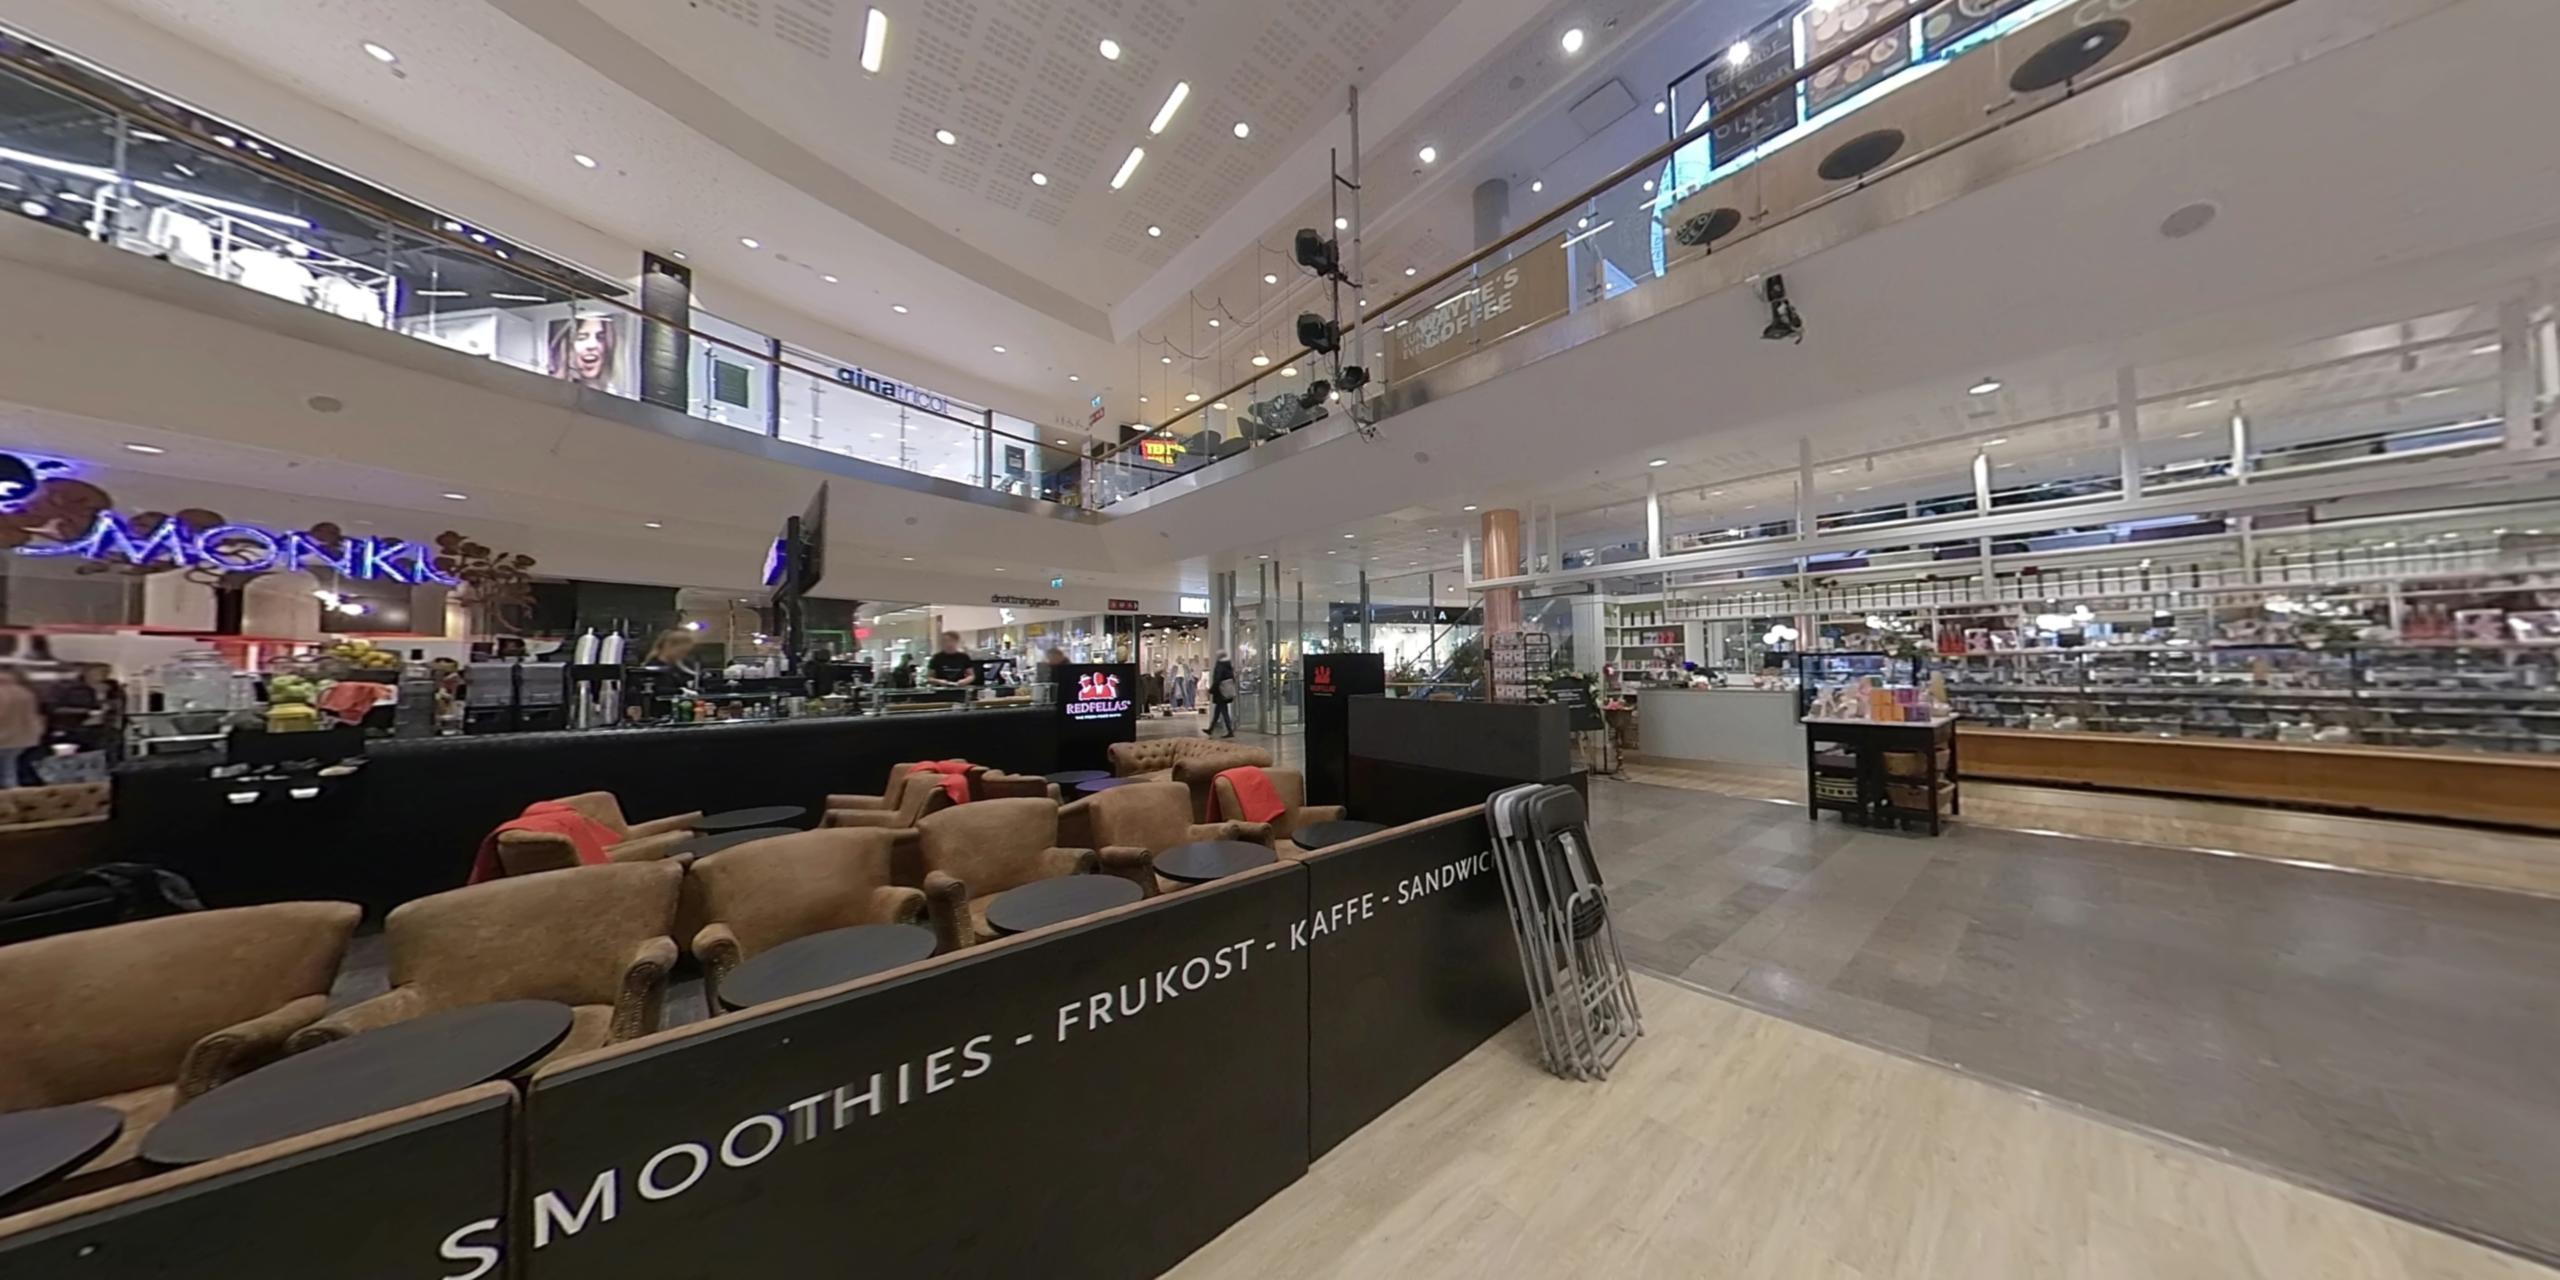 Mitt I city shopping center 360